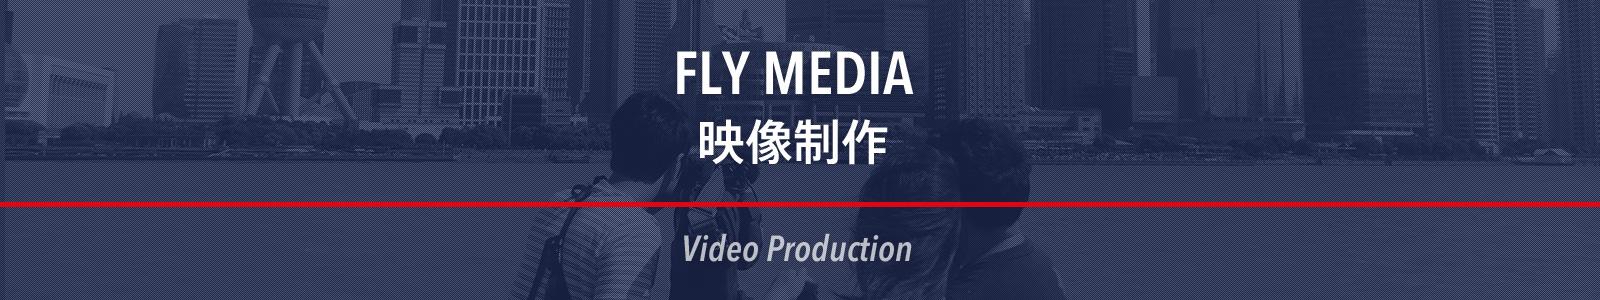 FLY MEDIA 映像制作